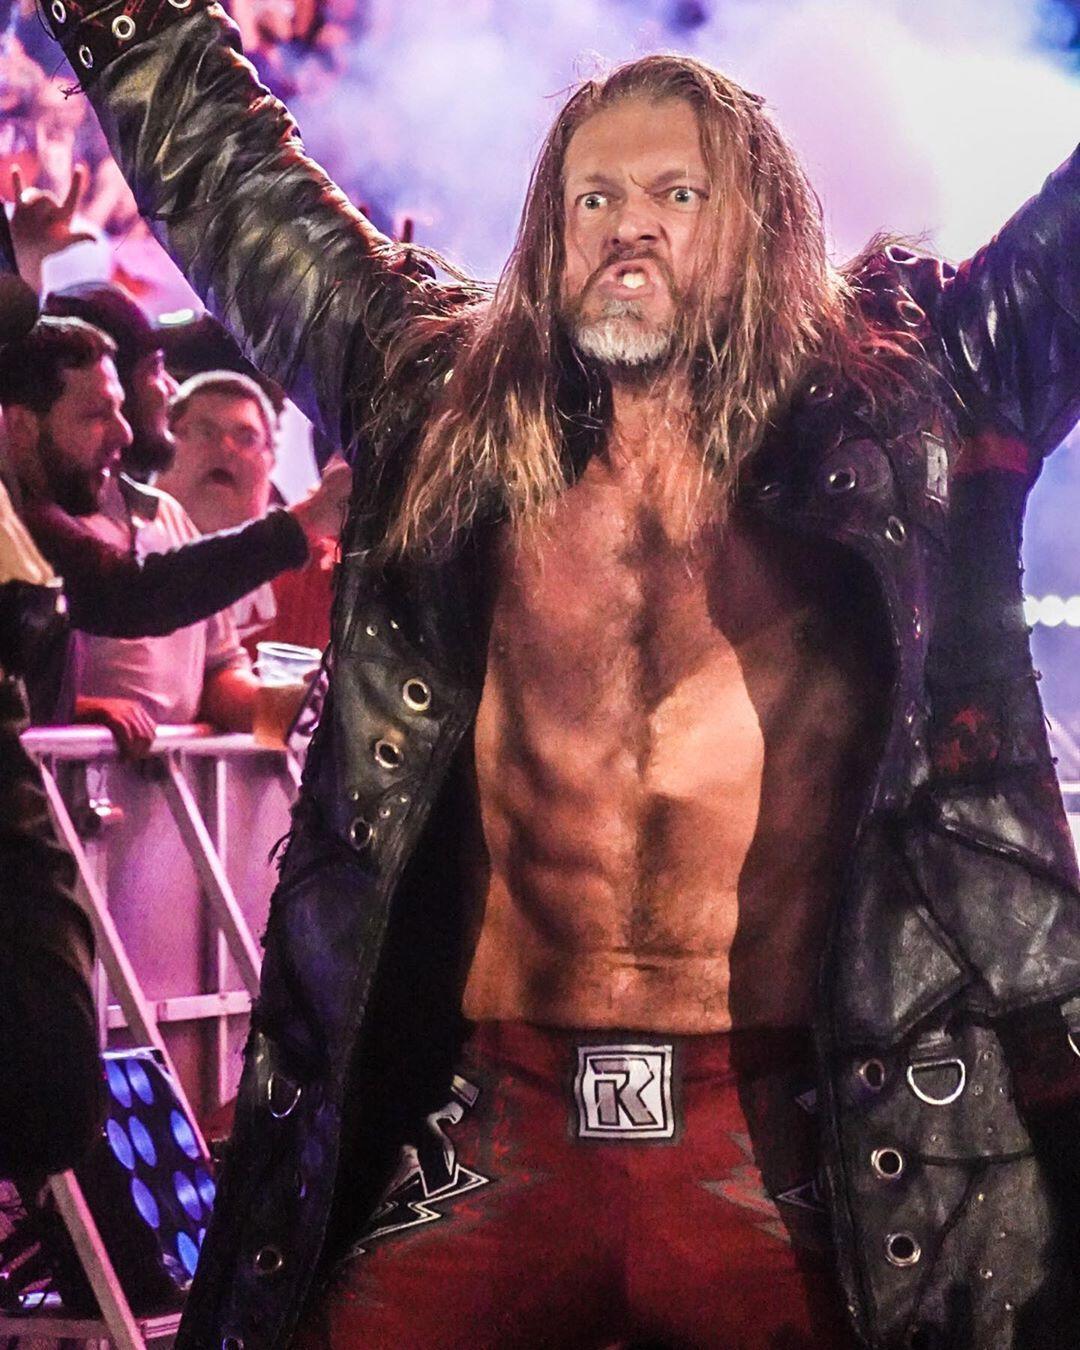 Pin by Lizzz🦄 on WWE ️ in 2020 Wrestling wwe, Wrestling